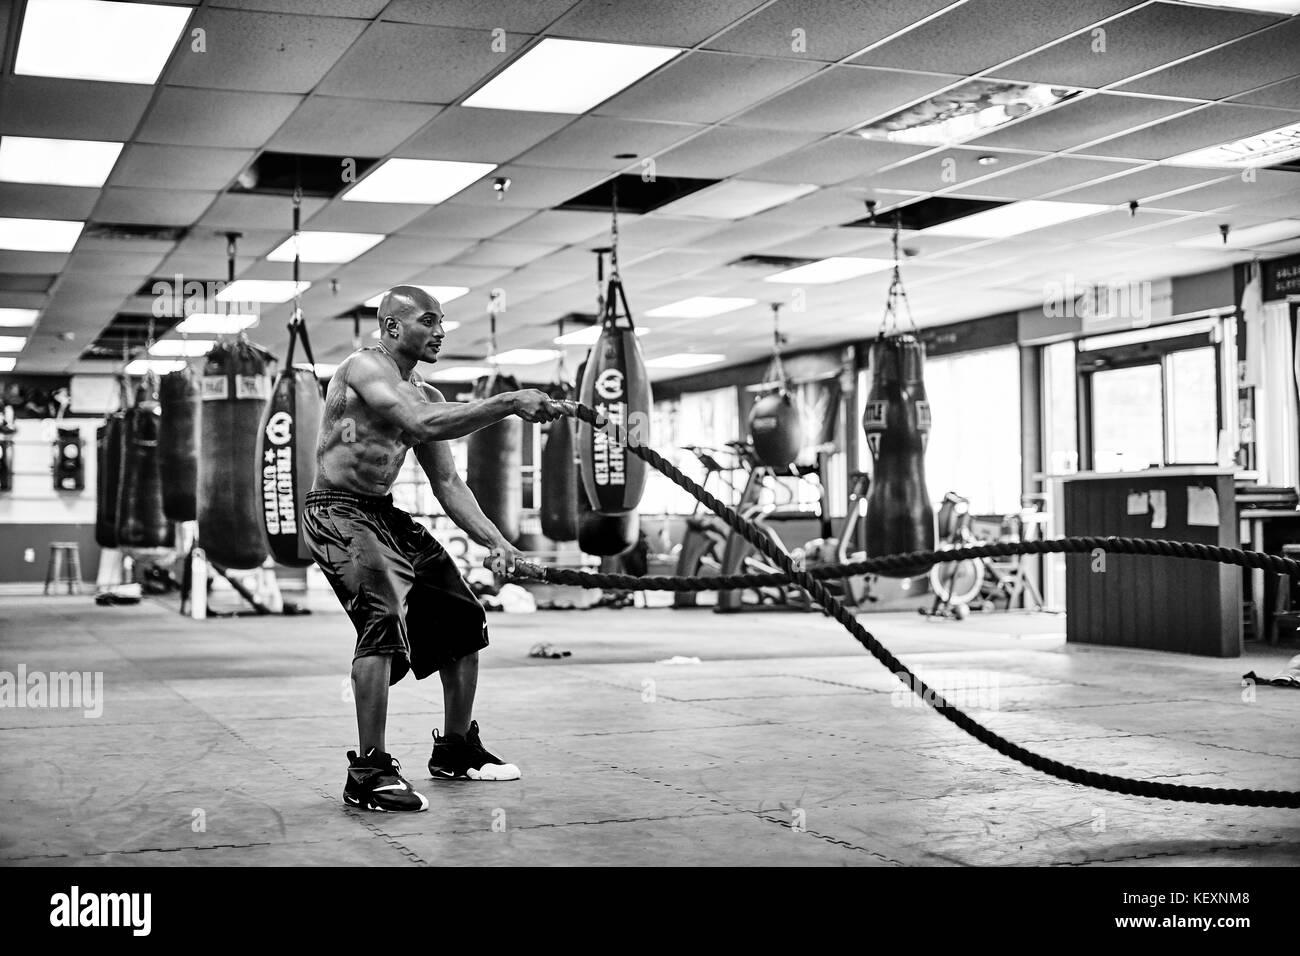 Shirtless athlete training in gym with battle ropes, Taunton, Massachusetts, USA - Stock Image